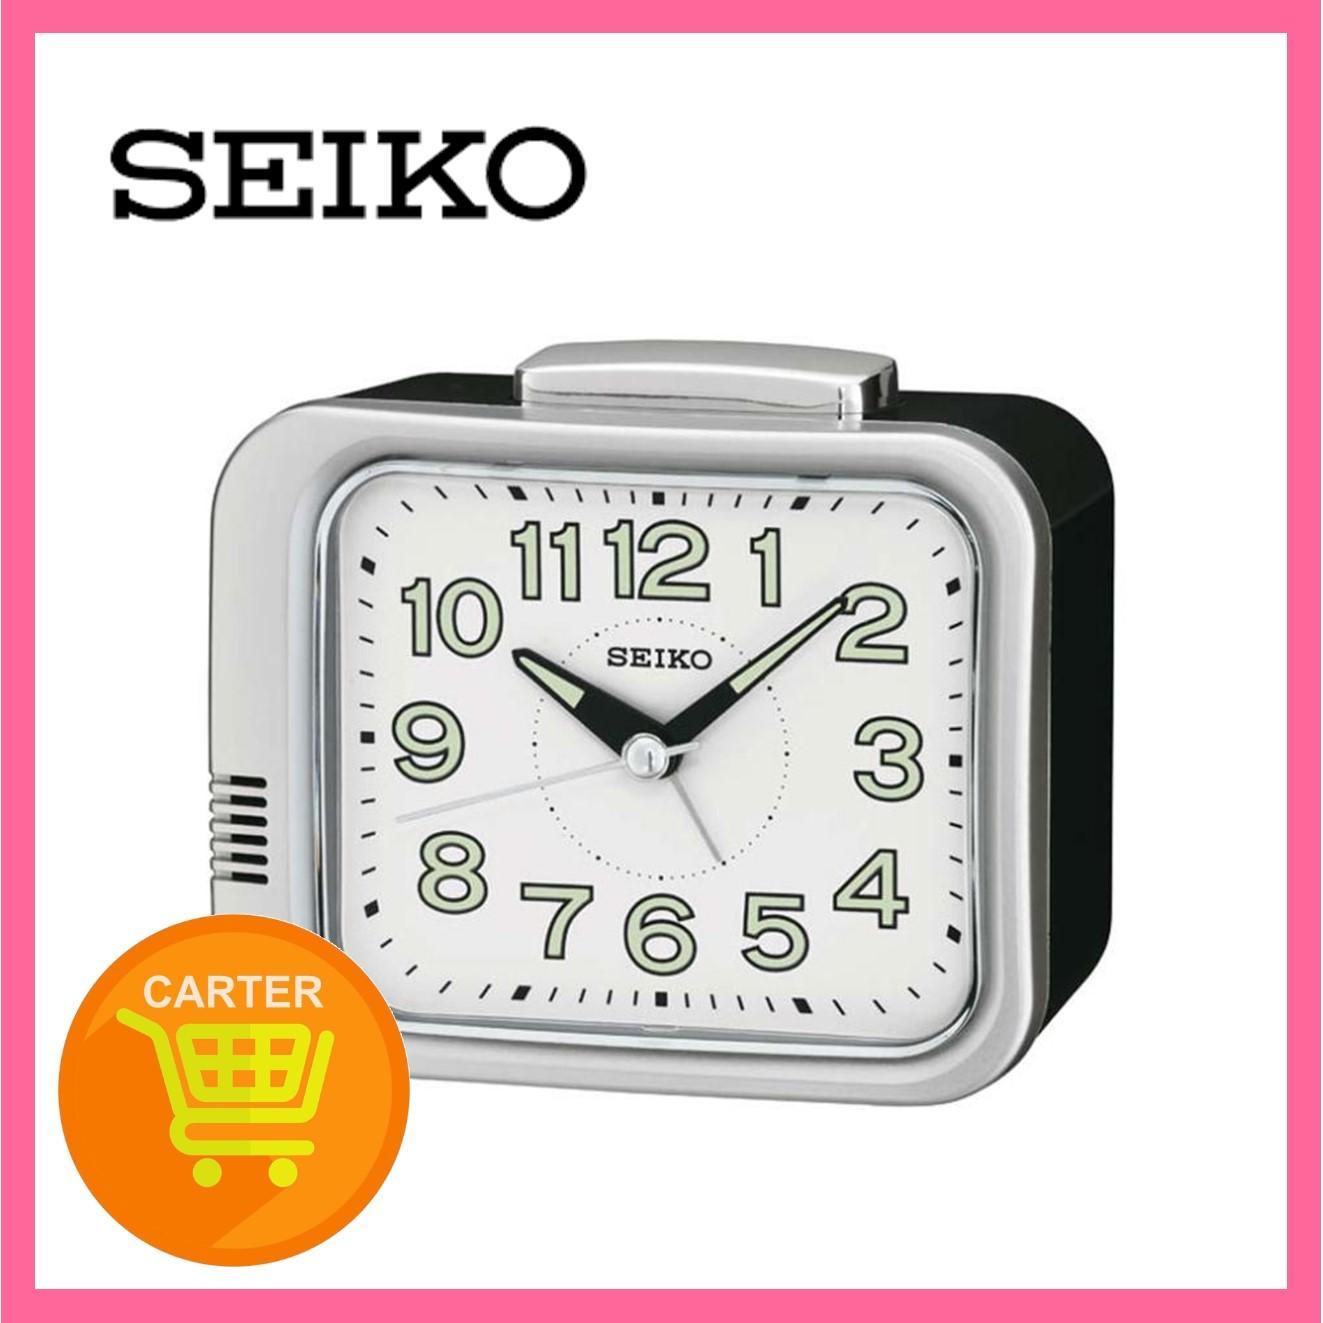 QHK028 SEIKO SILENT MOVEMENT ALARM CLOCK (BELL) SILVER